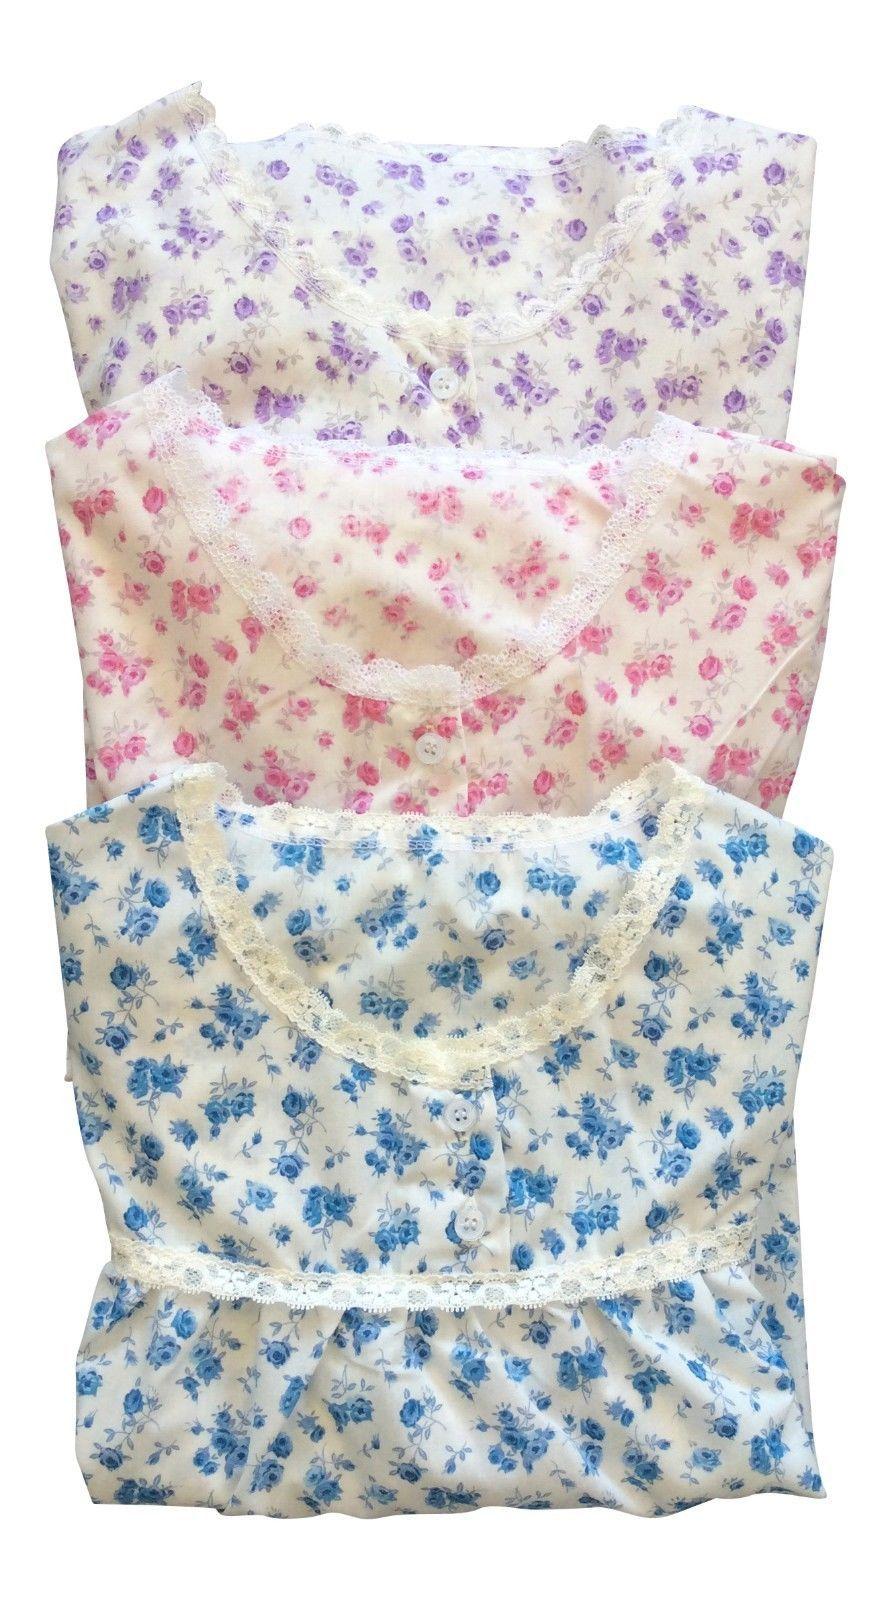 Womens Long Vintage Floral Cute Nightdress Gown Nightie, in Pink, Purple or Blue - $17.99